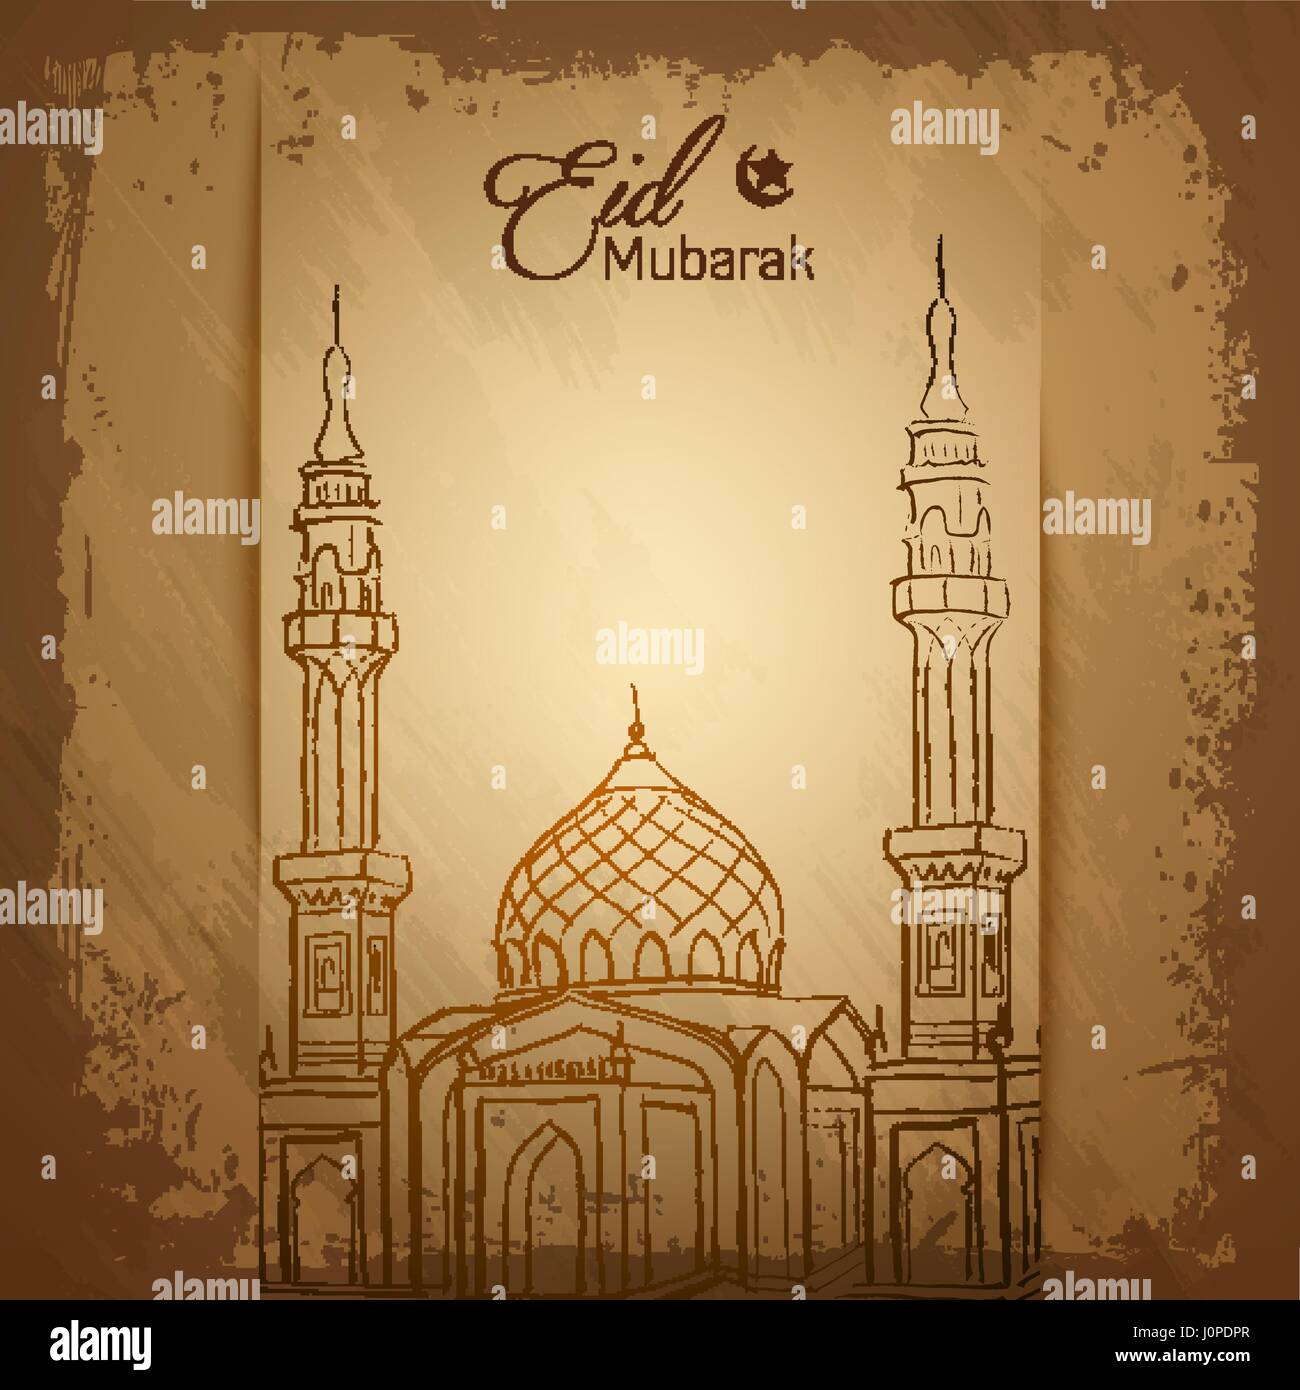 Eid mubarak islamic greeting card background stock vector art eid mubarak islamic greeting card background kristyandbryce Image collections